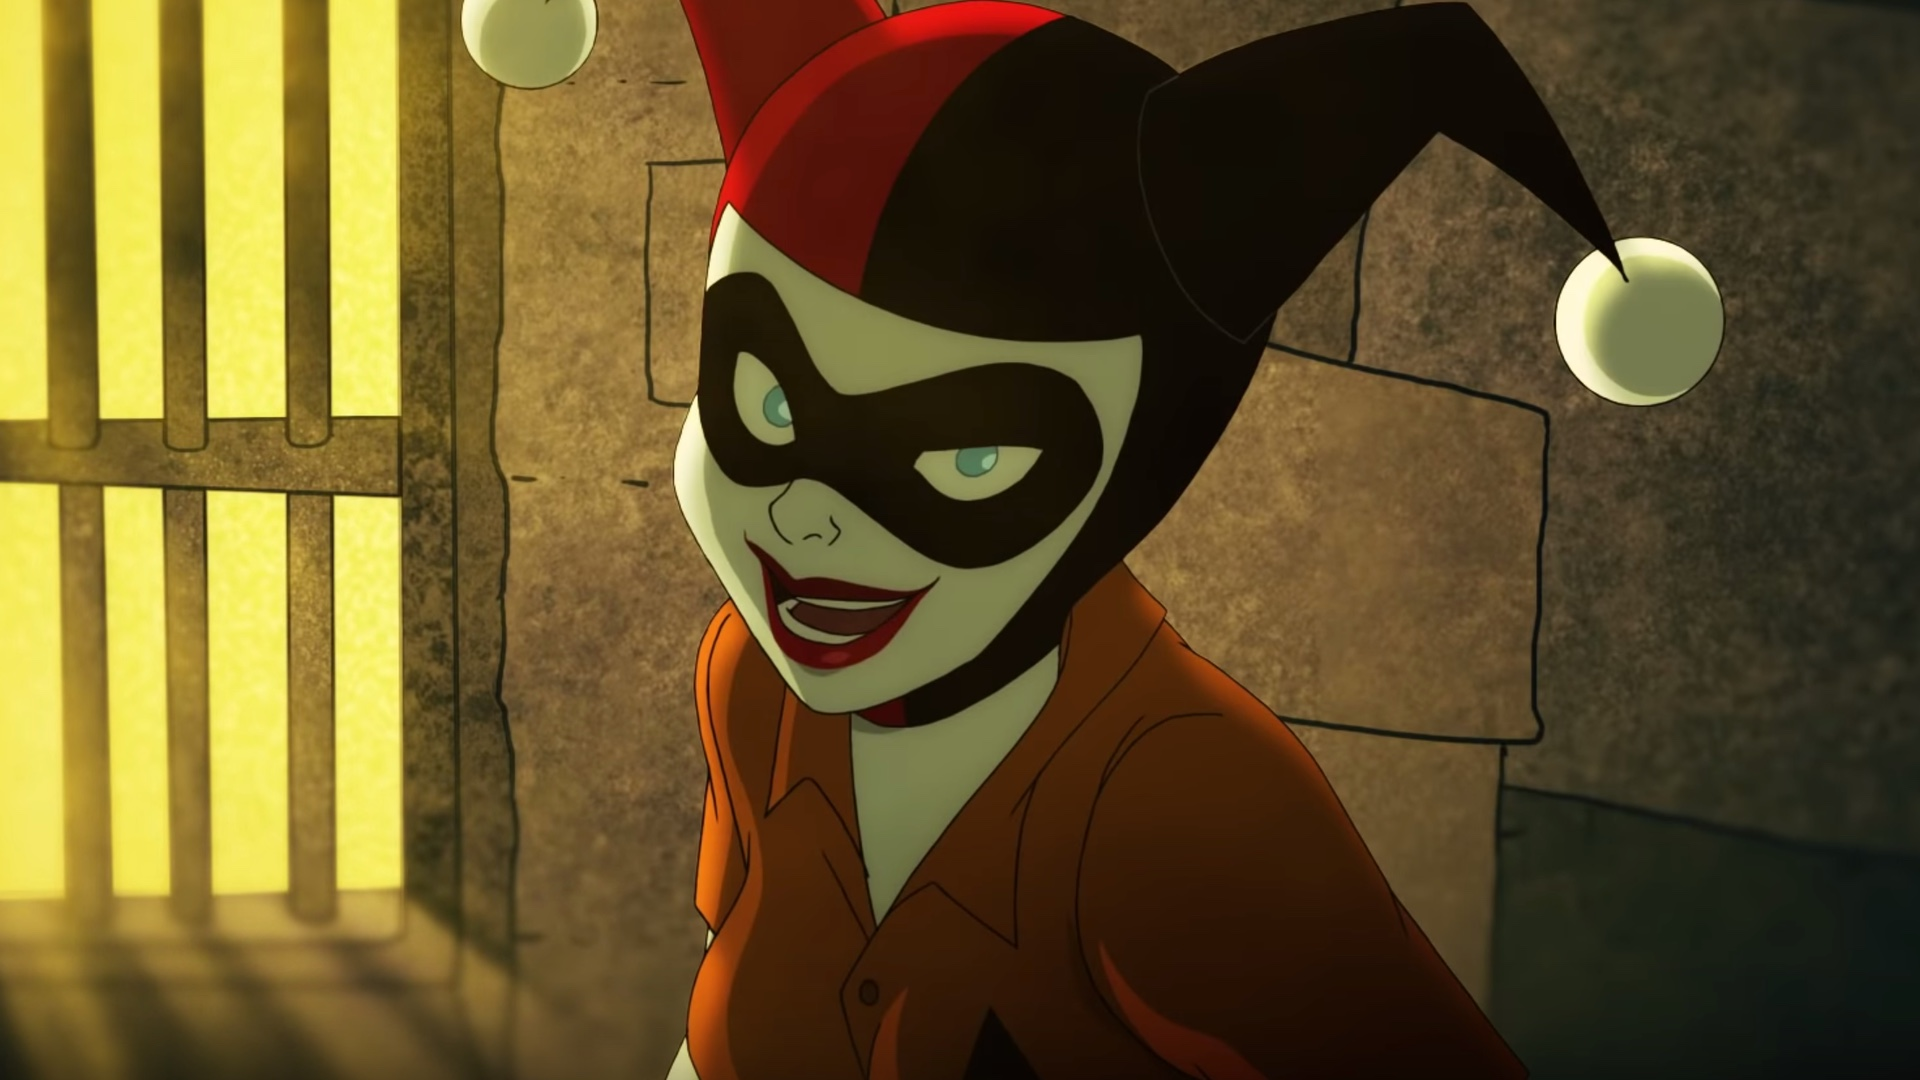 Courtesy of Warner Bros